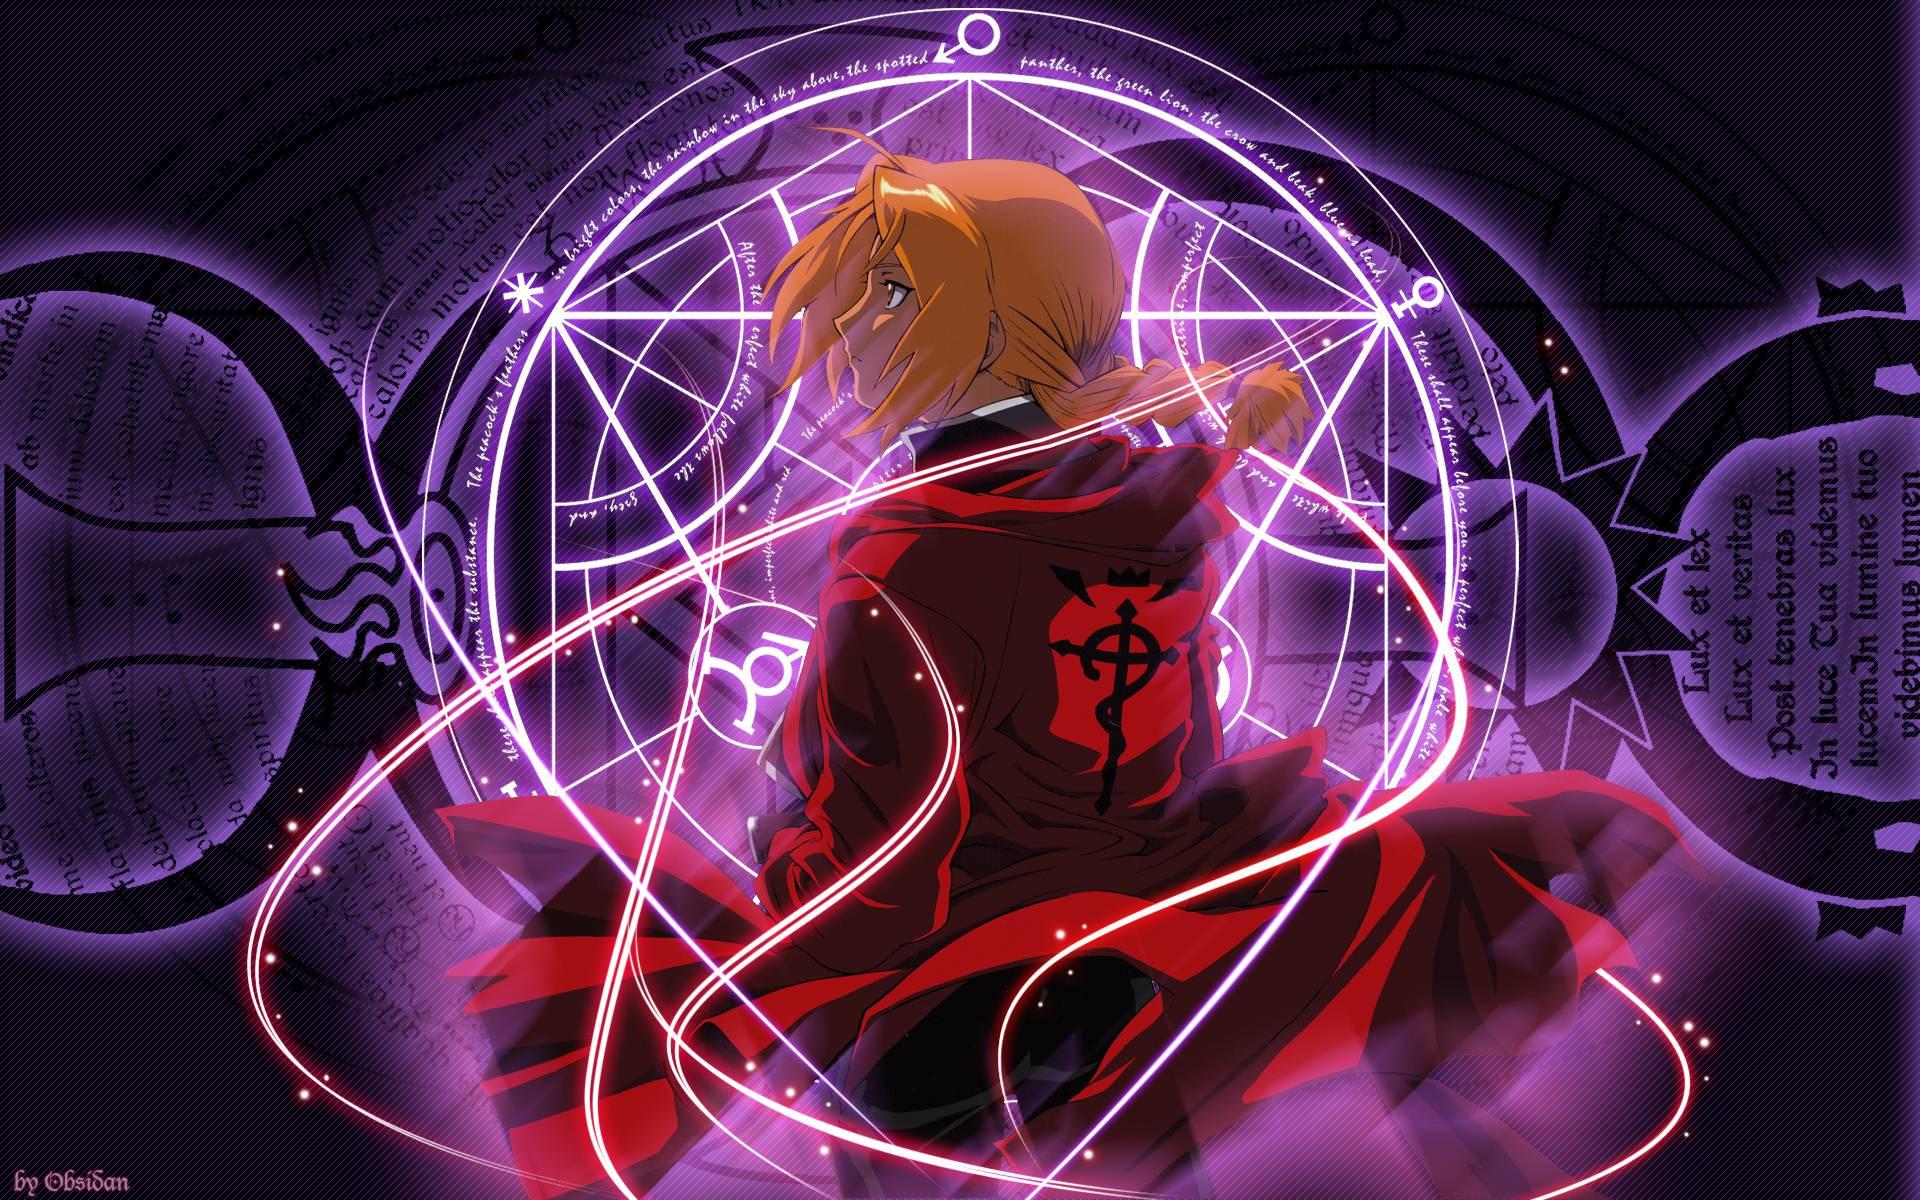 Fullmetal Alchemist: Brotherhood Wallpapers - Wallpaper Cave